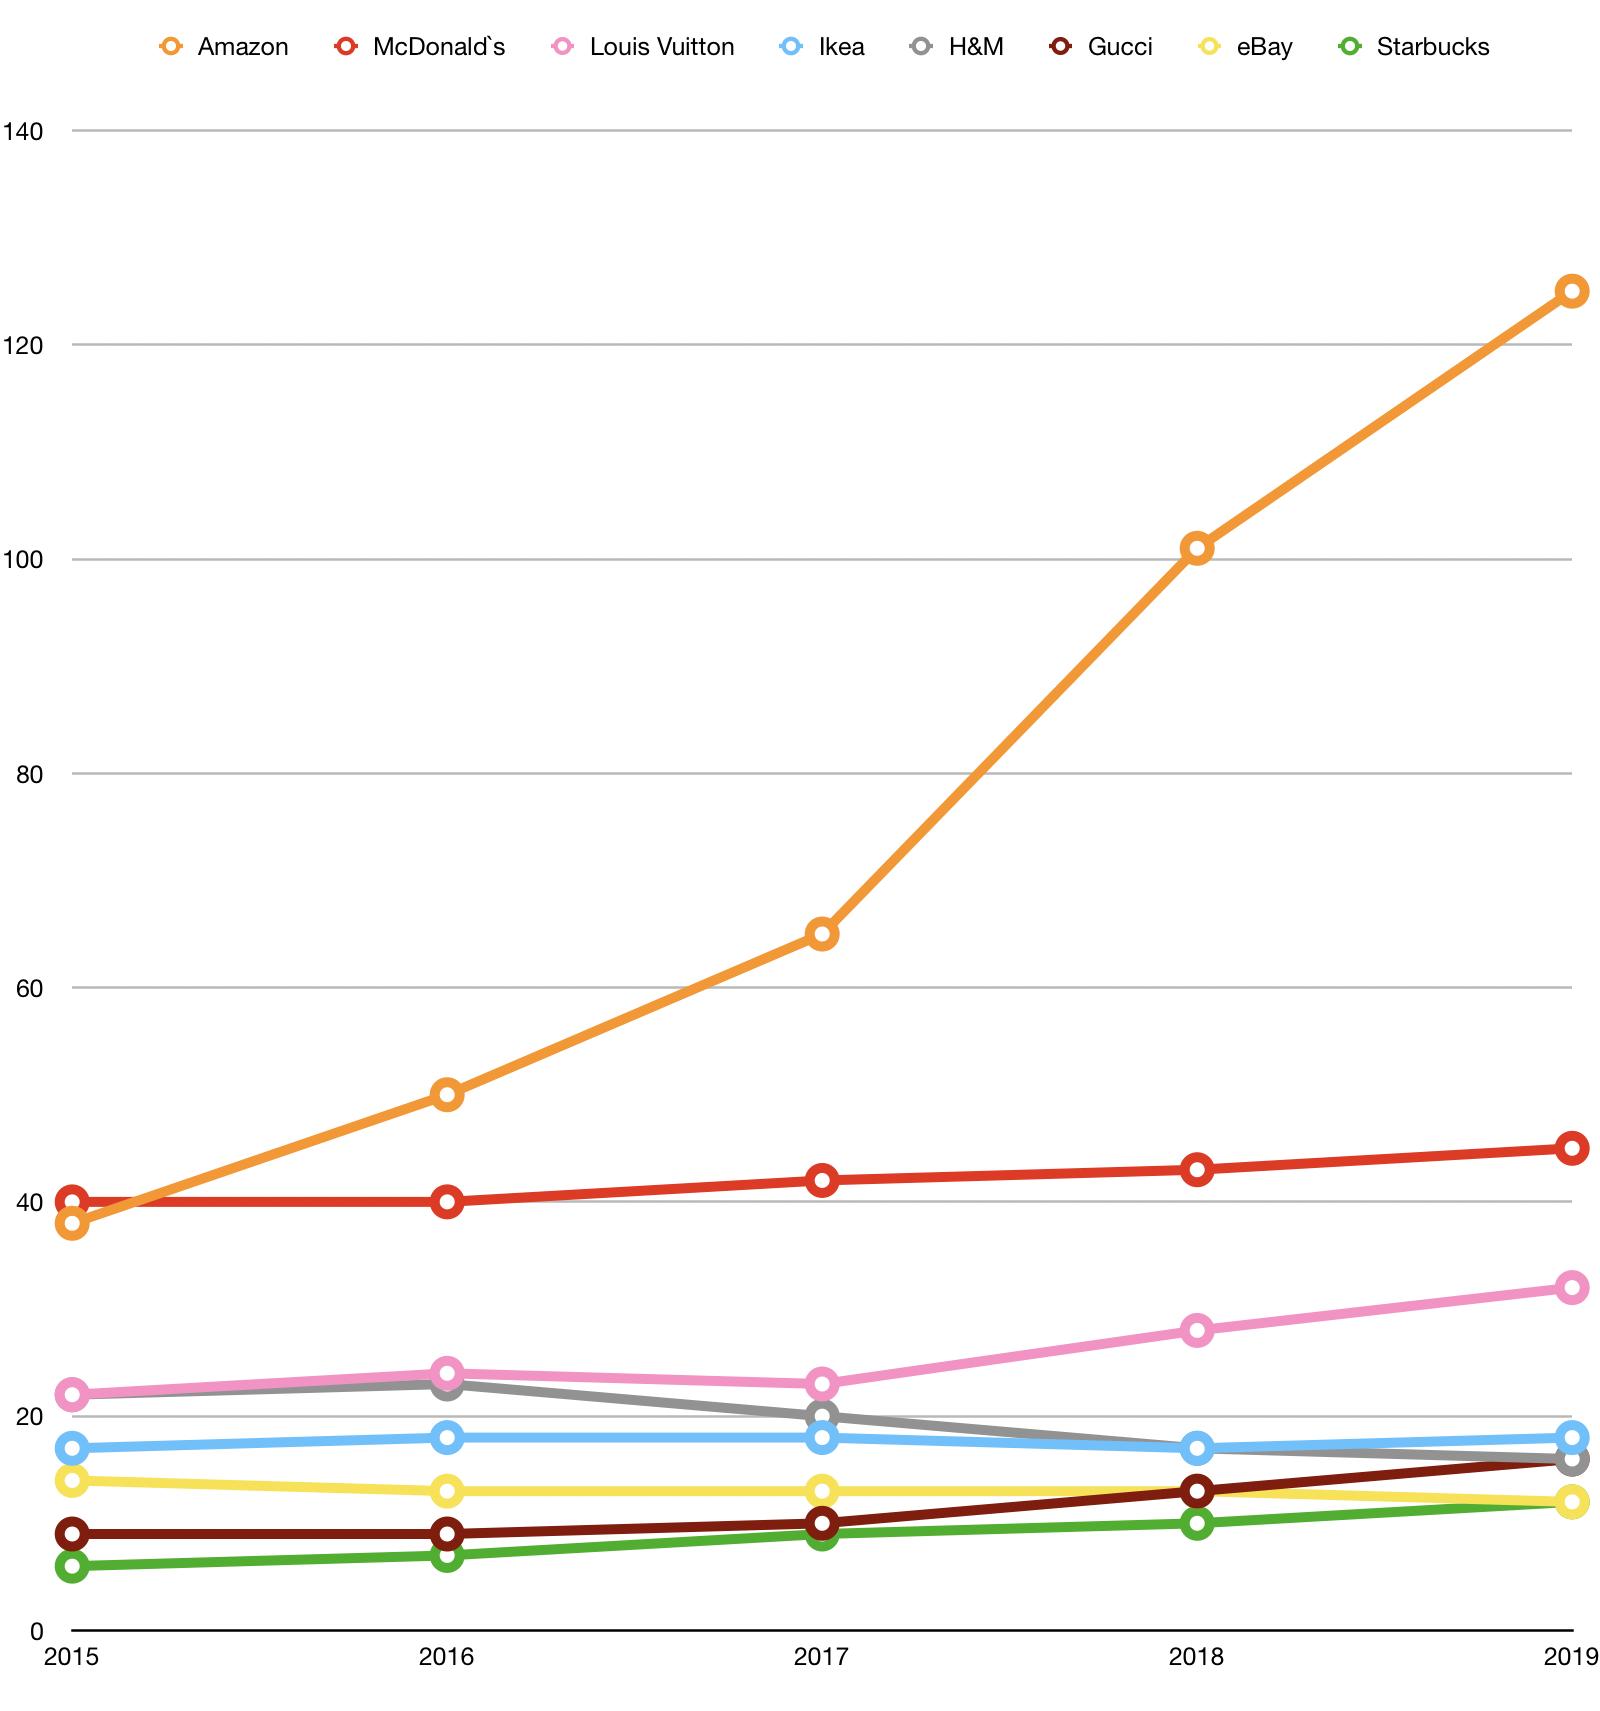 Vývoj hodnoty vybraných značek vposledních pěti letech, v miliardách USD. Zdroj: Interbrand